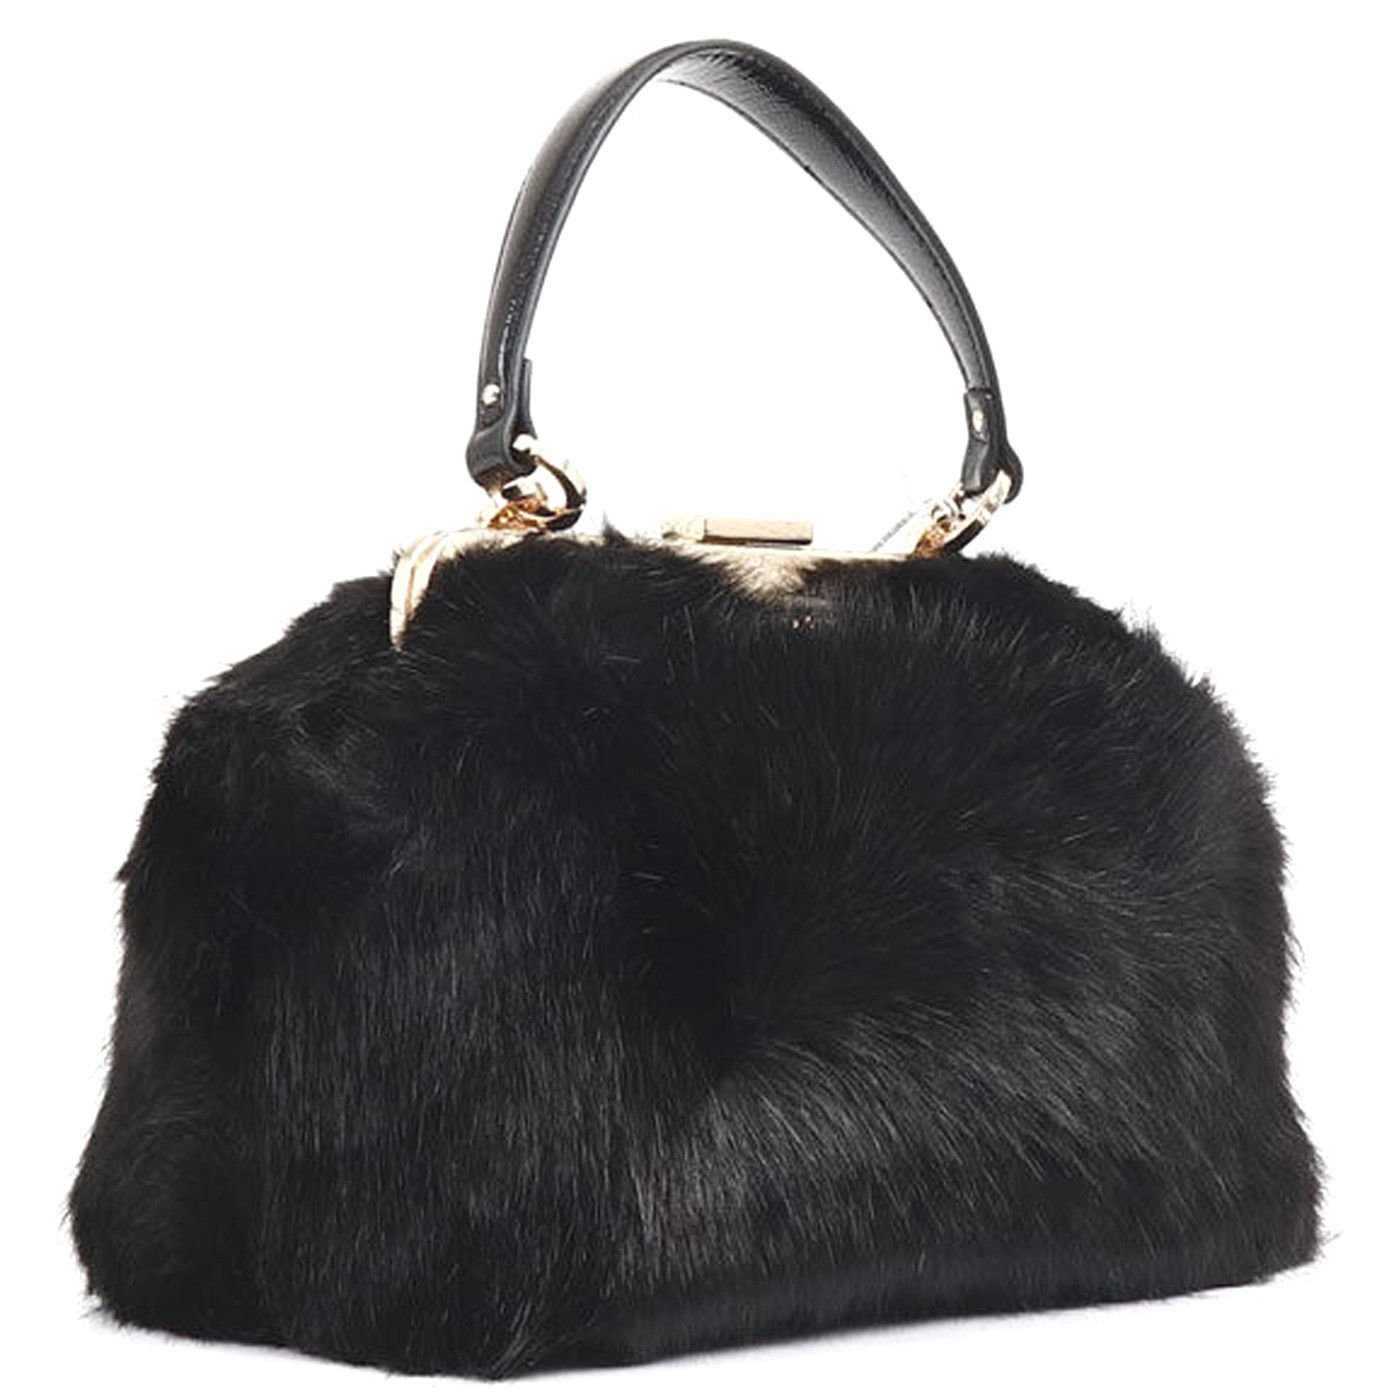 03acd75a3b50 PATRIZIA PEPE Woman s Shoulder Bag in BLACK FUR F W 2018-19 ...